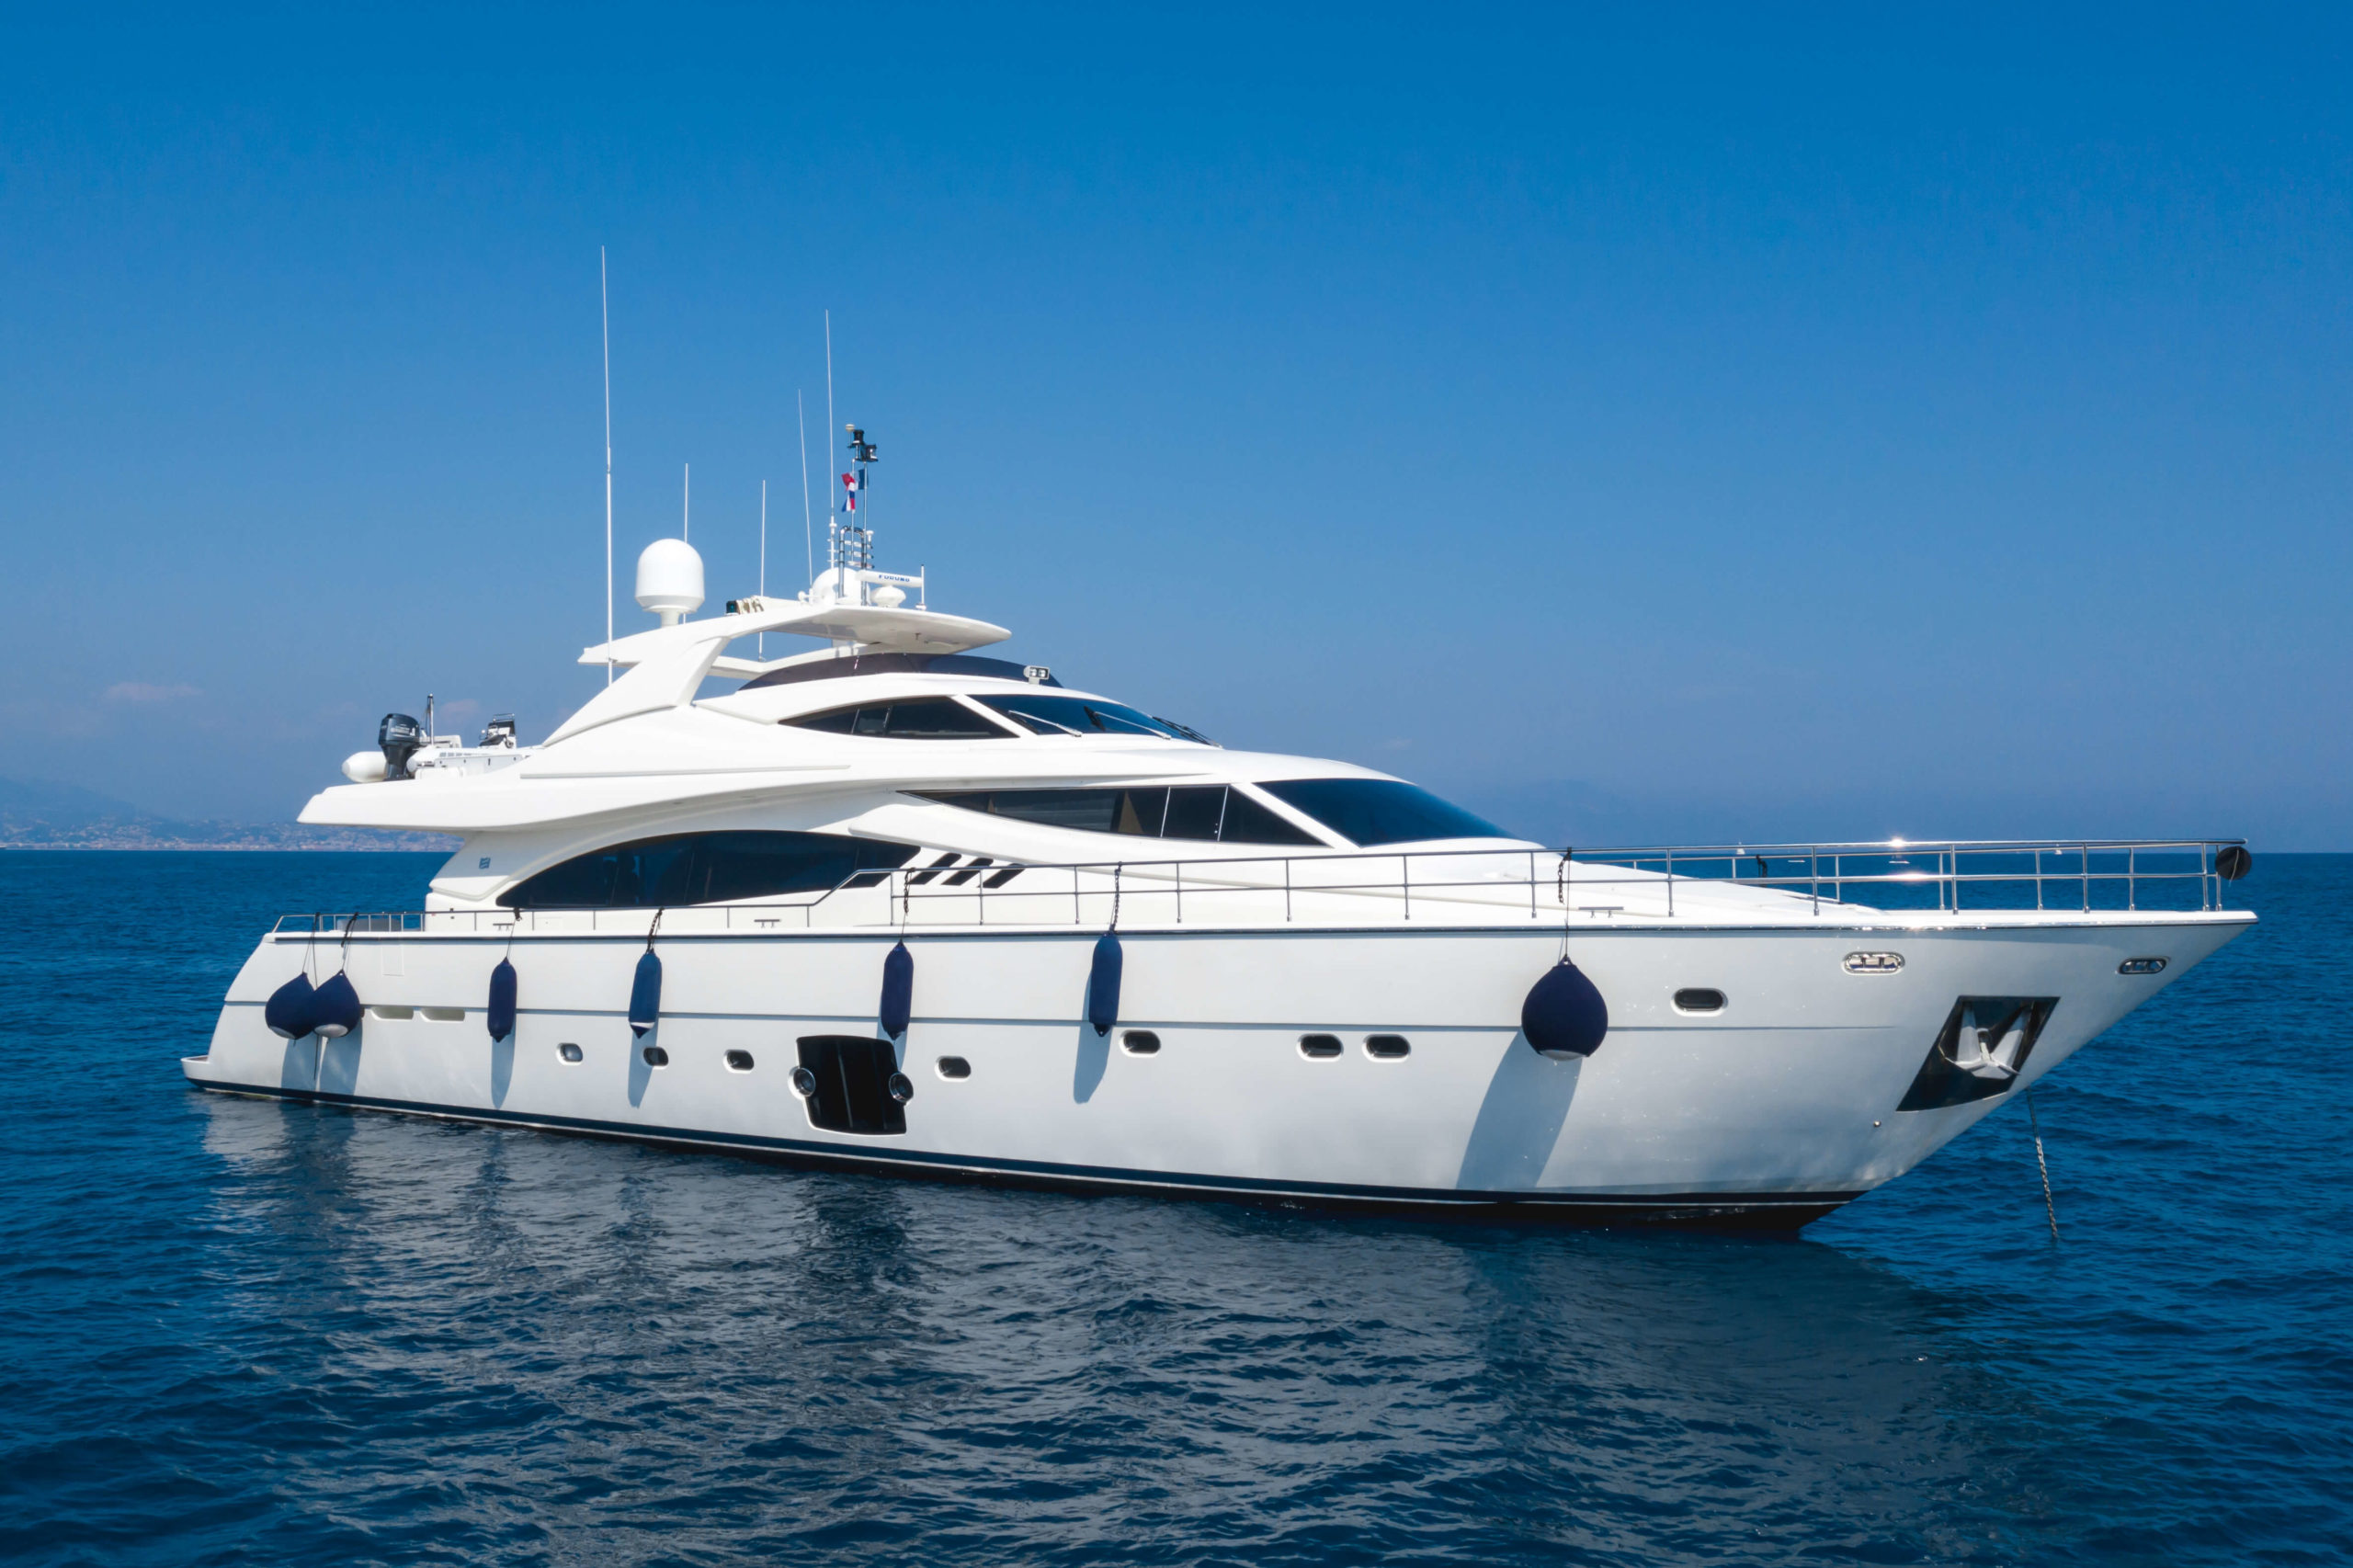 Location-bateaux-ang-yachting-ferretti-881-saint-tropez.jpg